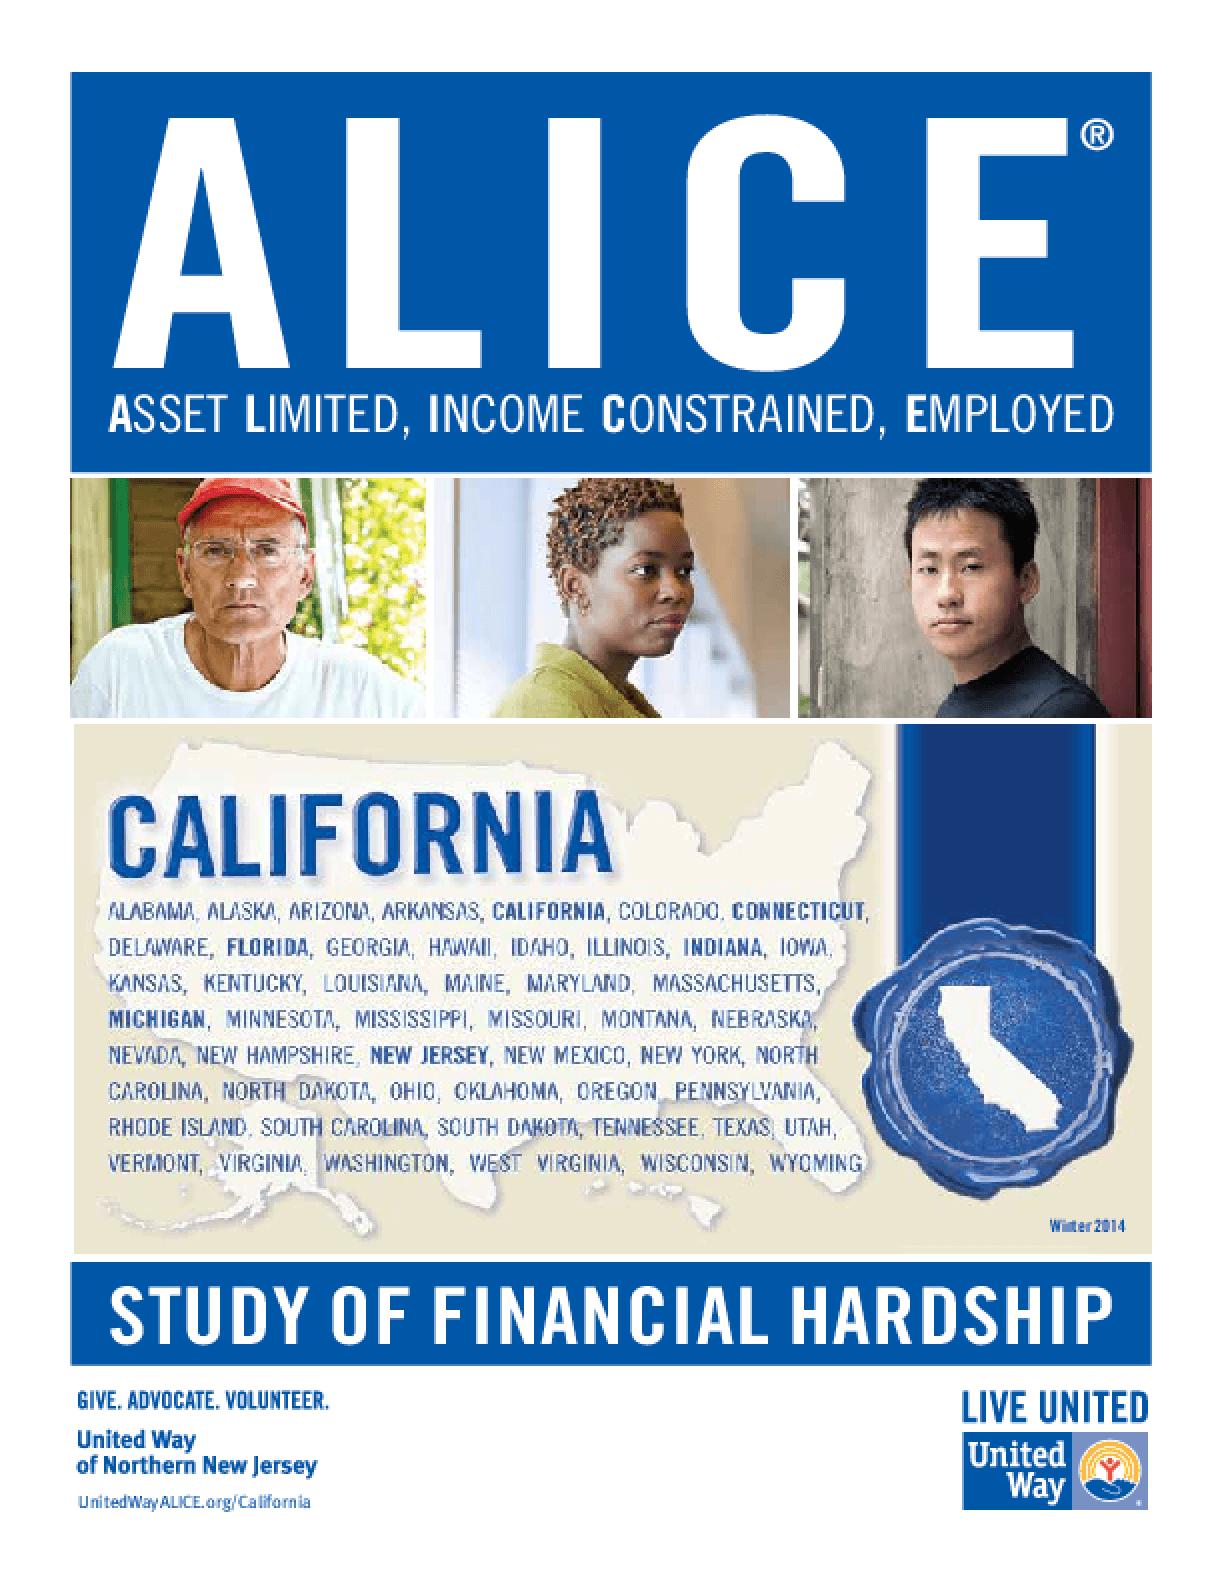 ALICE: Study of Financial Hardship-California